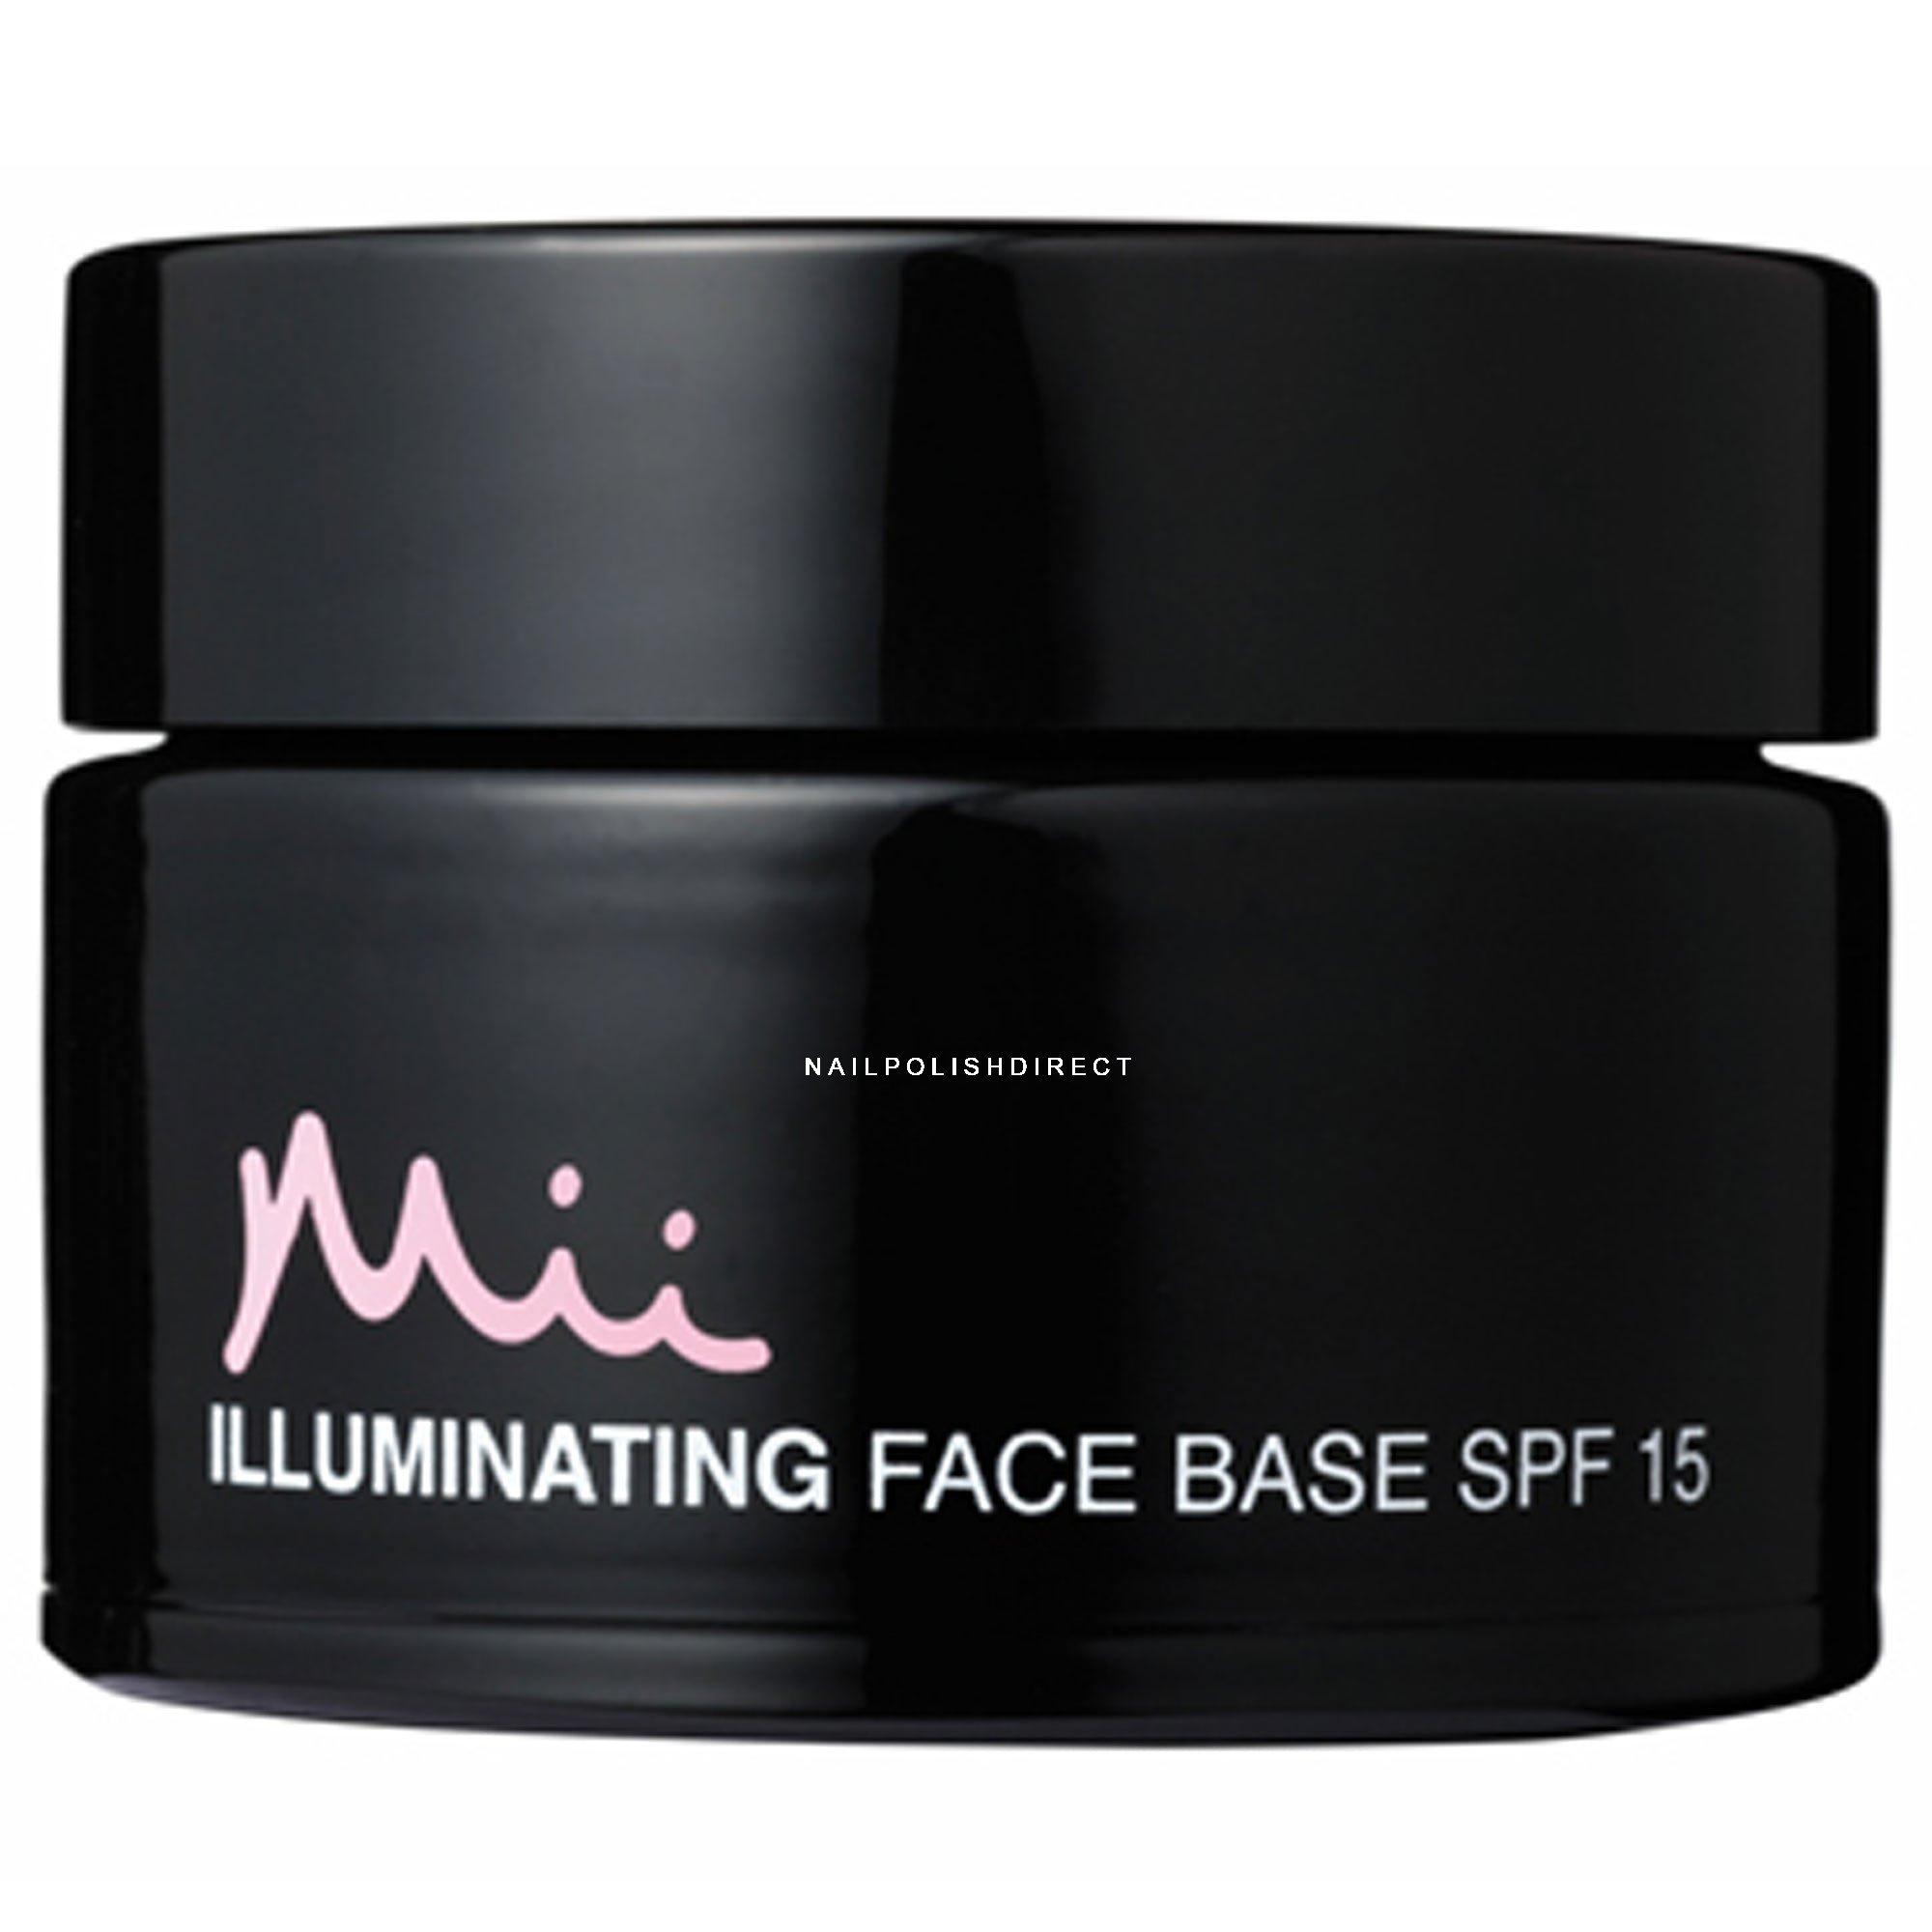 96e458821697 Illuminating Face Base Foundation SPF 15